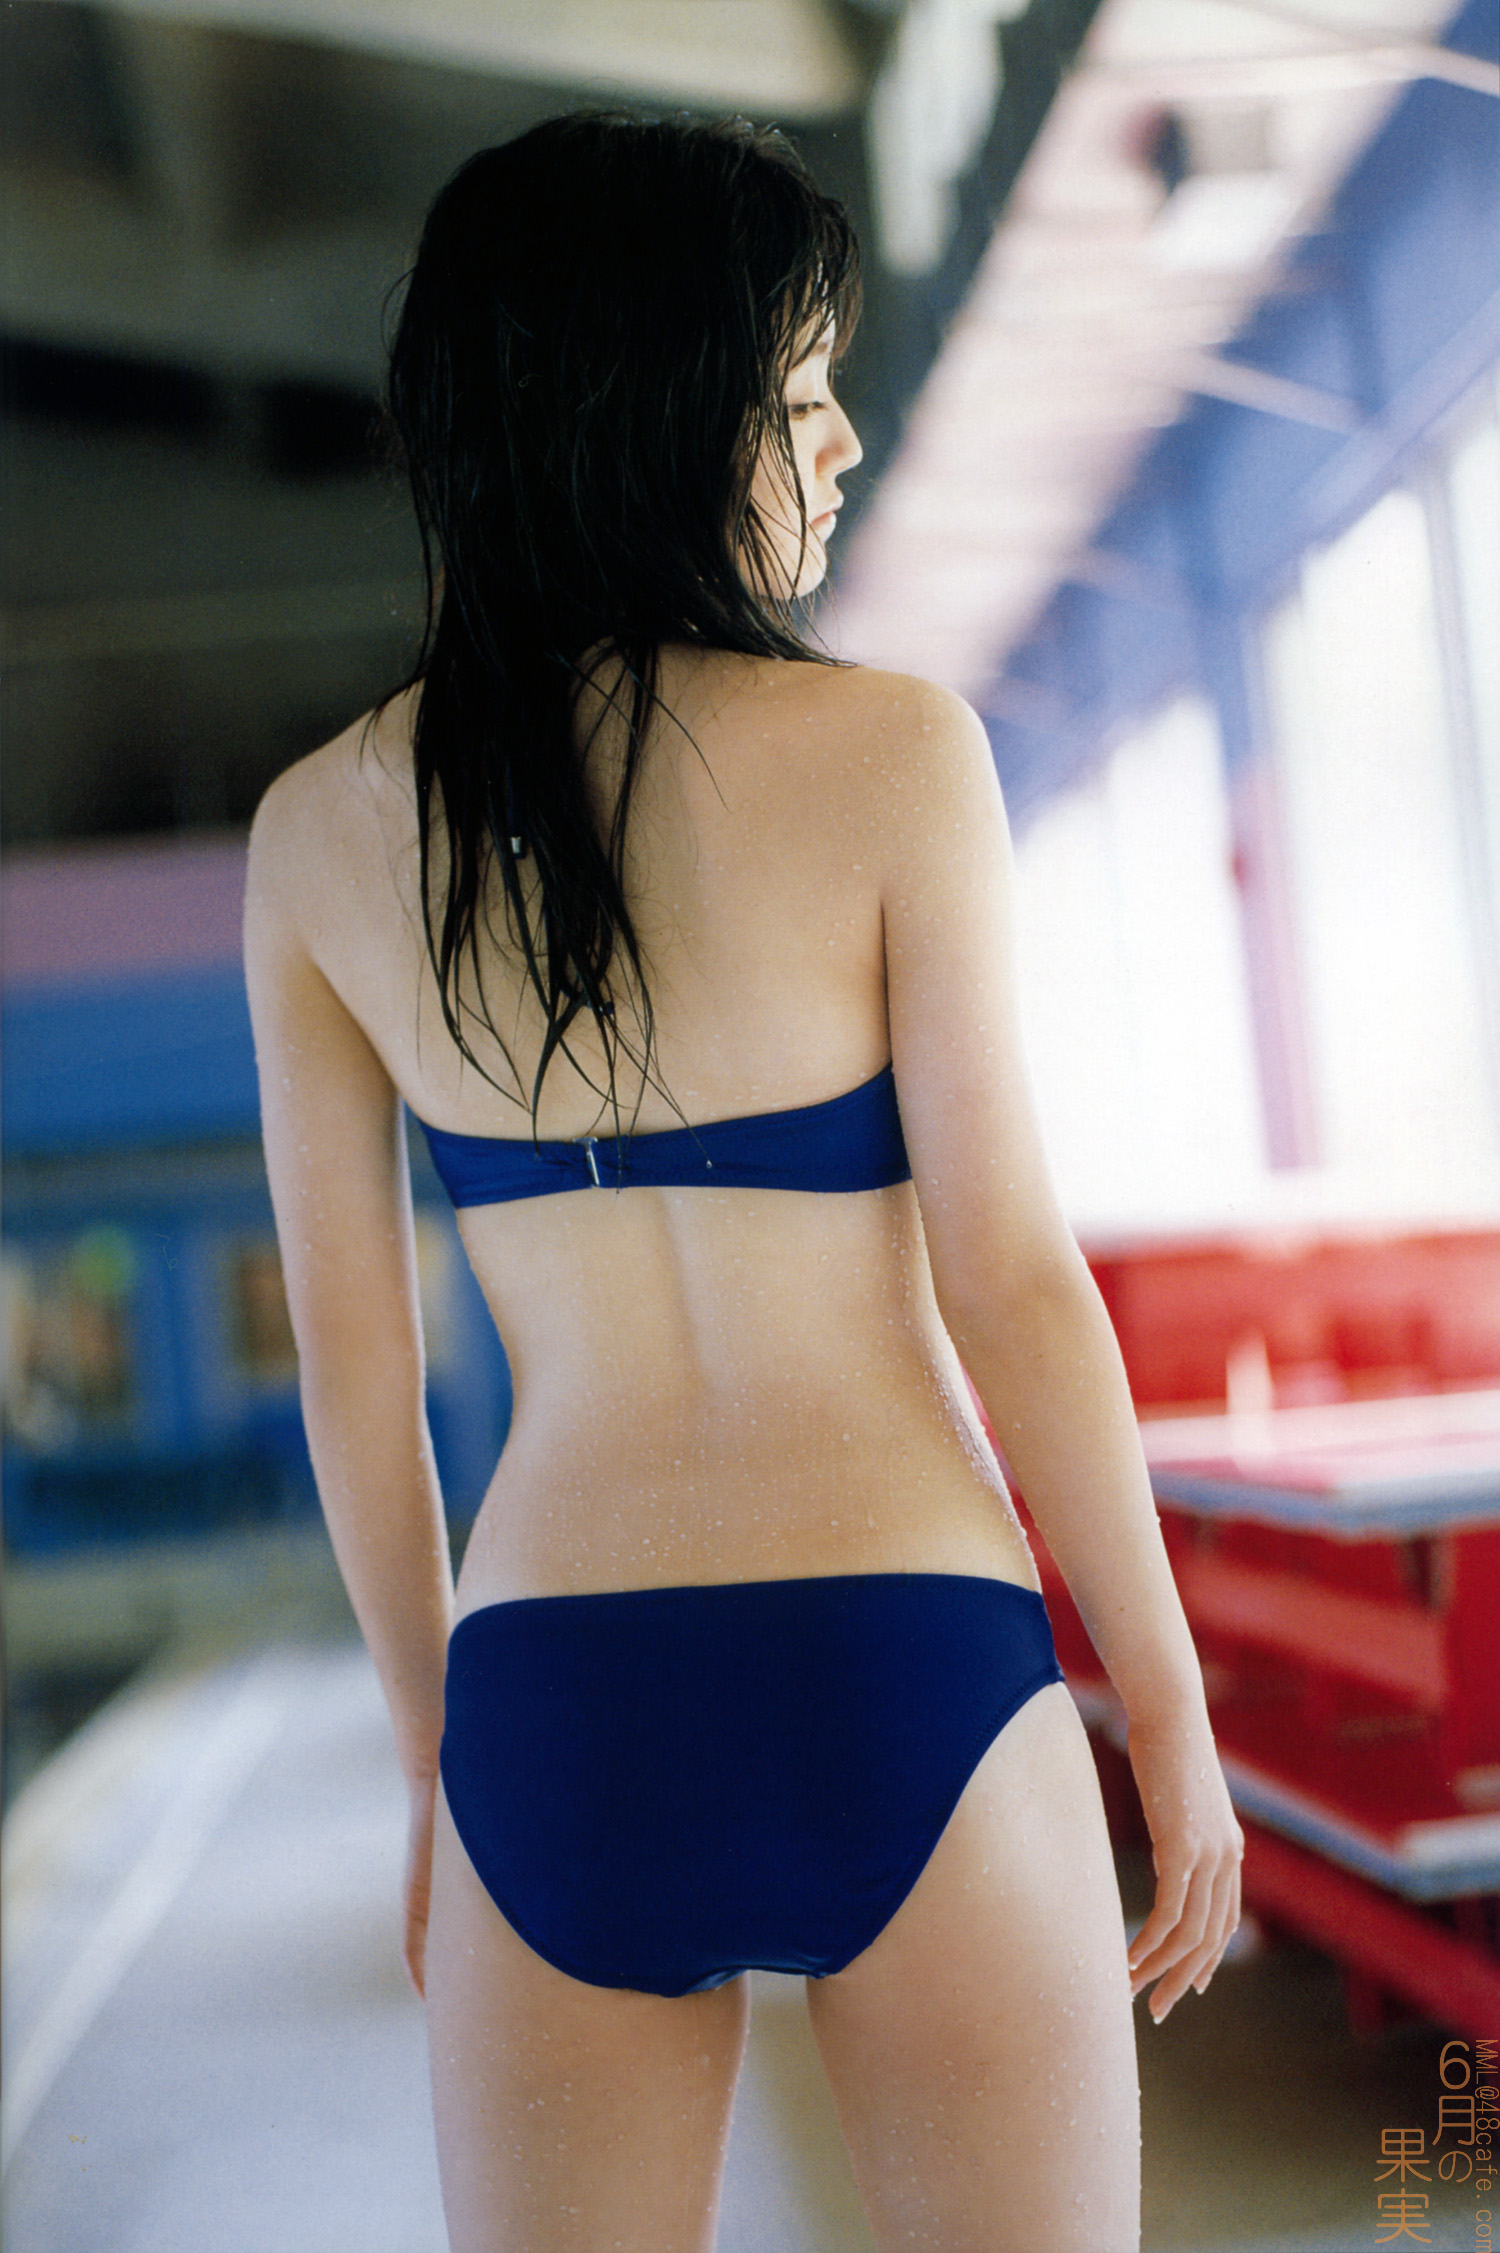 ・SET・Riko kawanisi・ Although ...